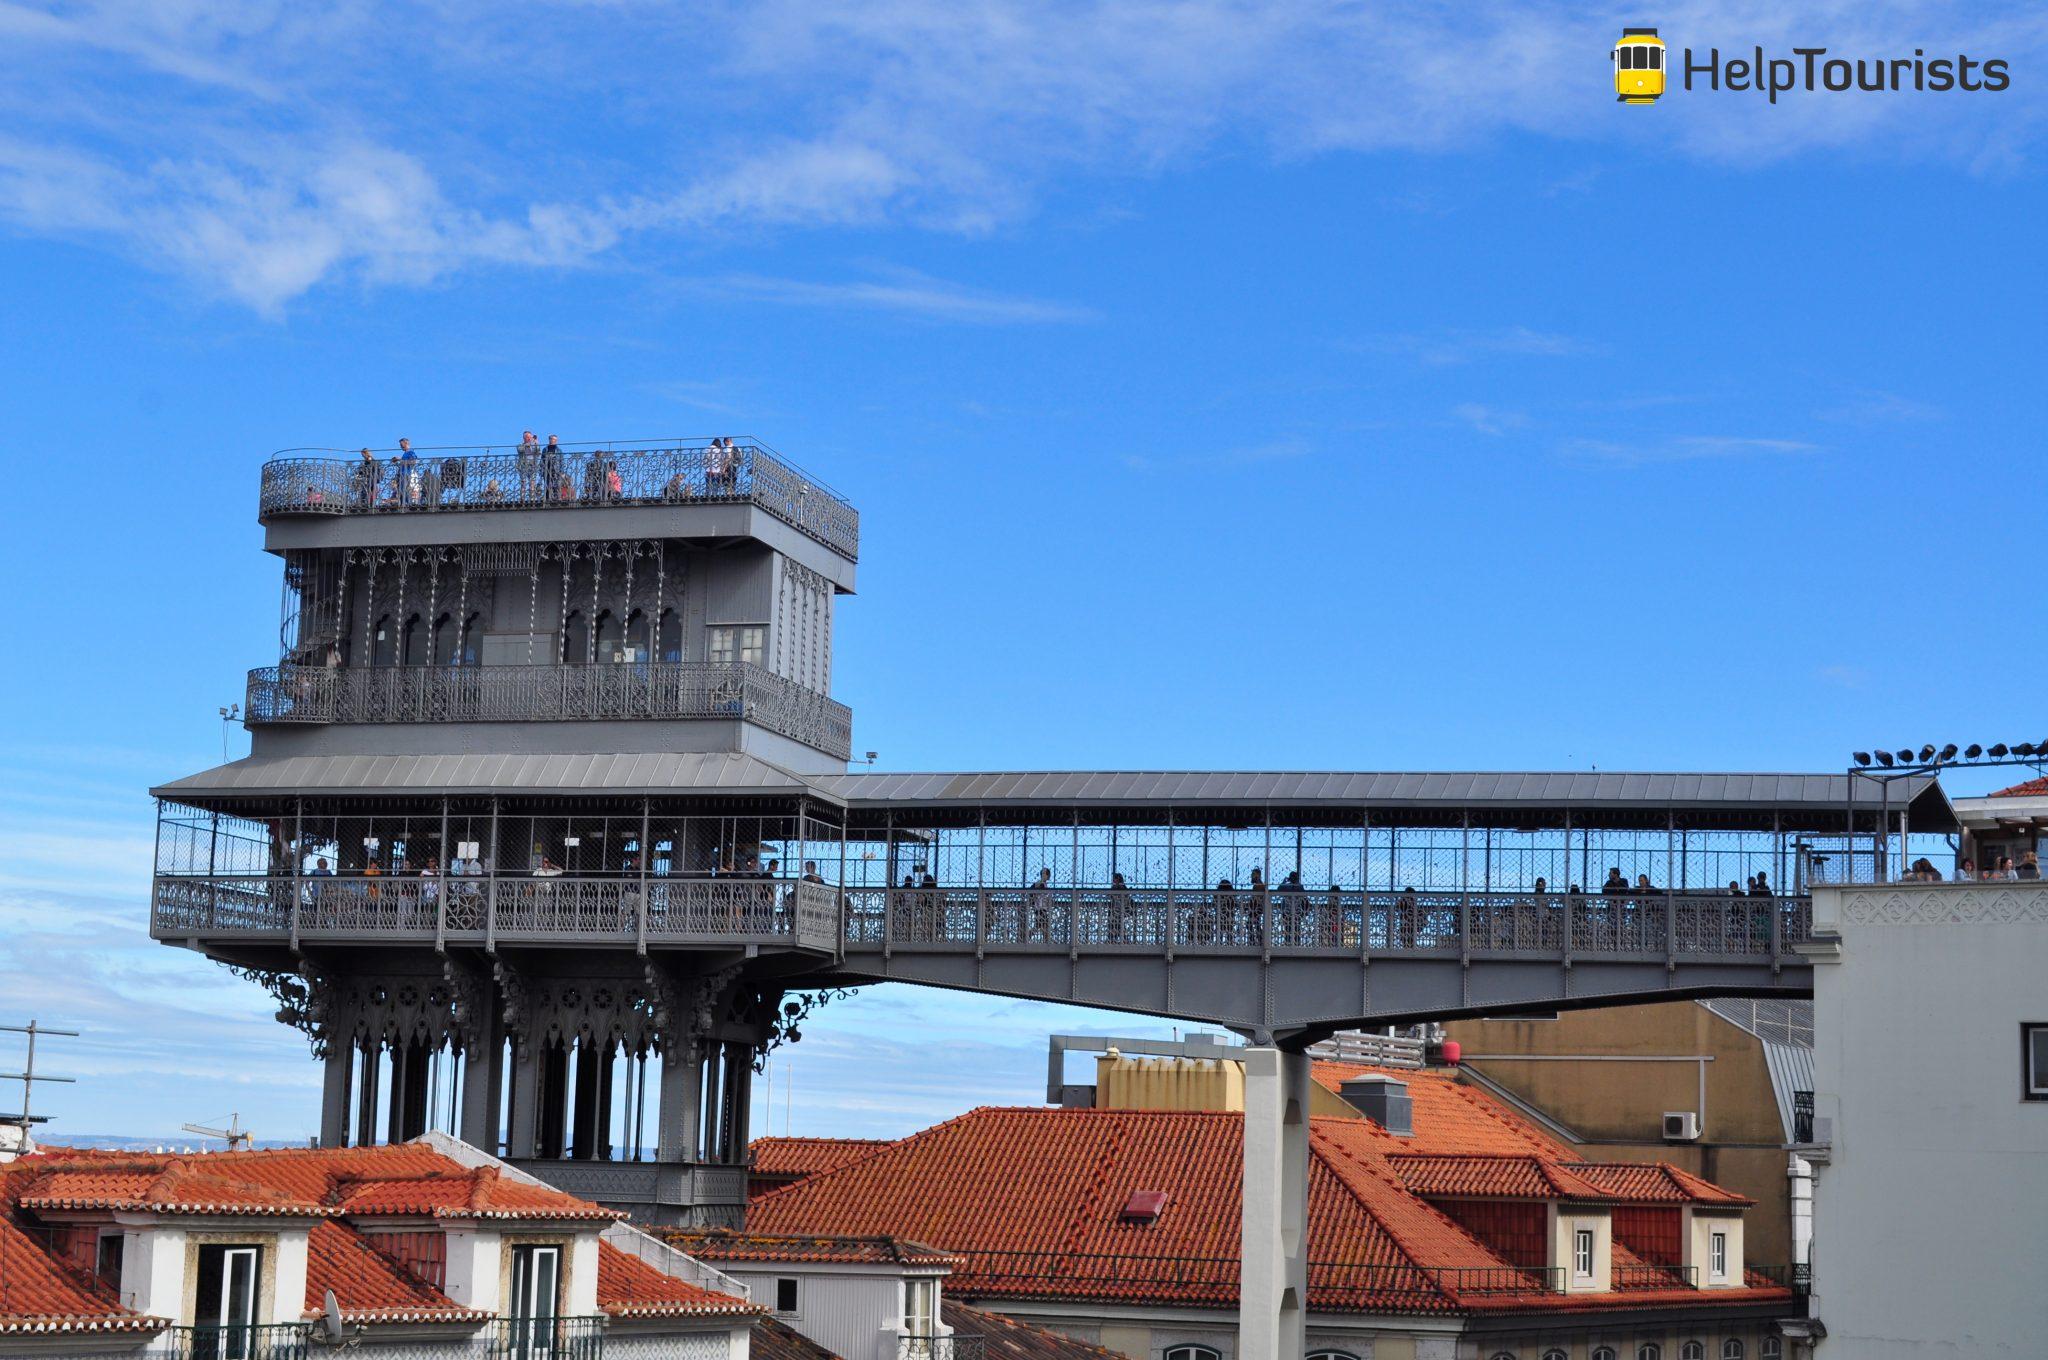 Lissabon Santa Justa Sonne